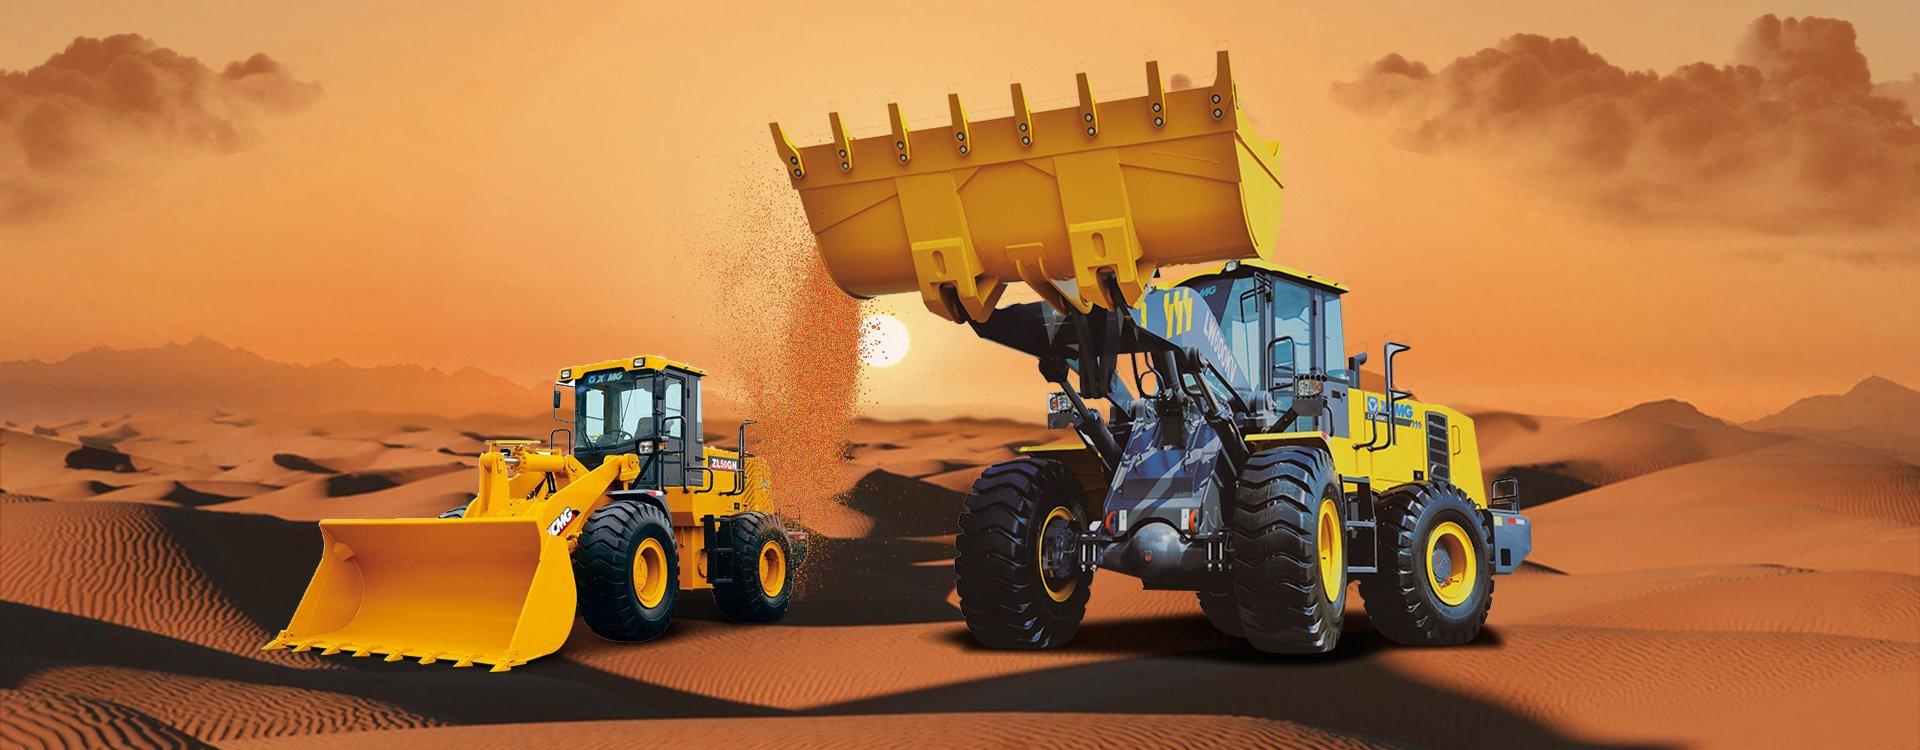 XCMG machine parts|JAC truck parts|ZOOMLION parts seller